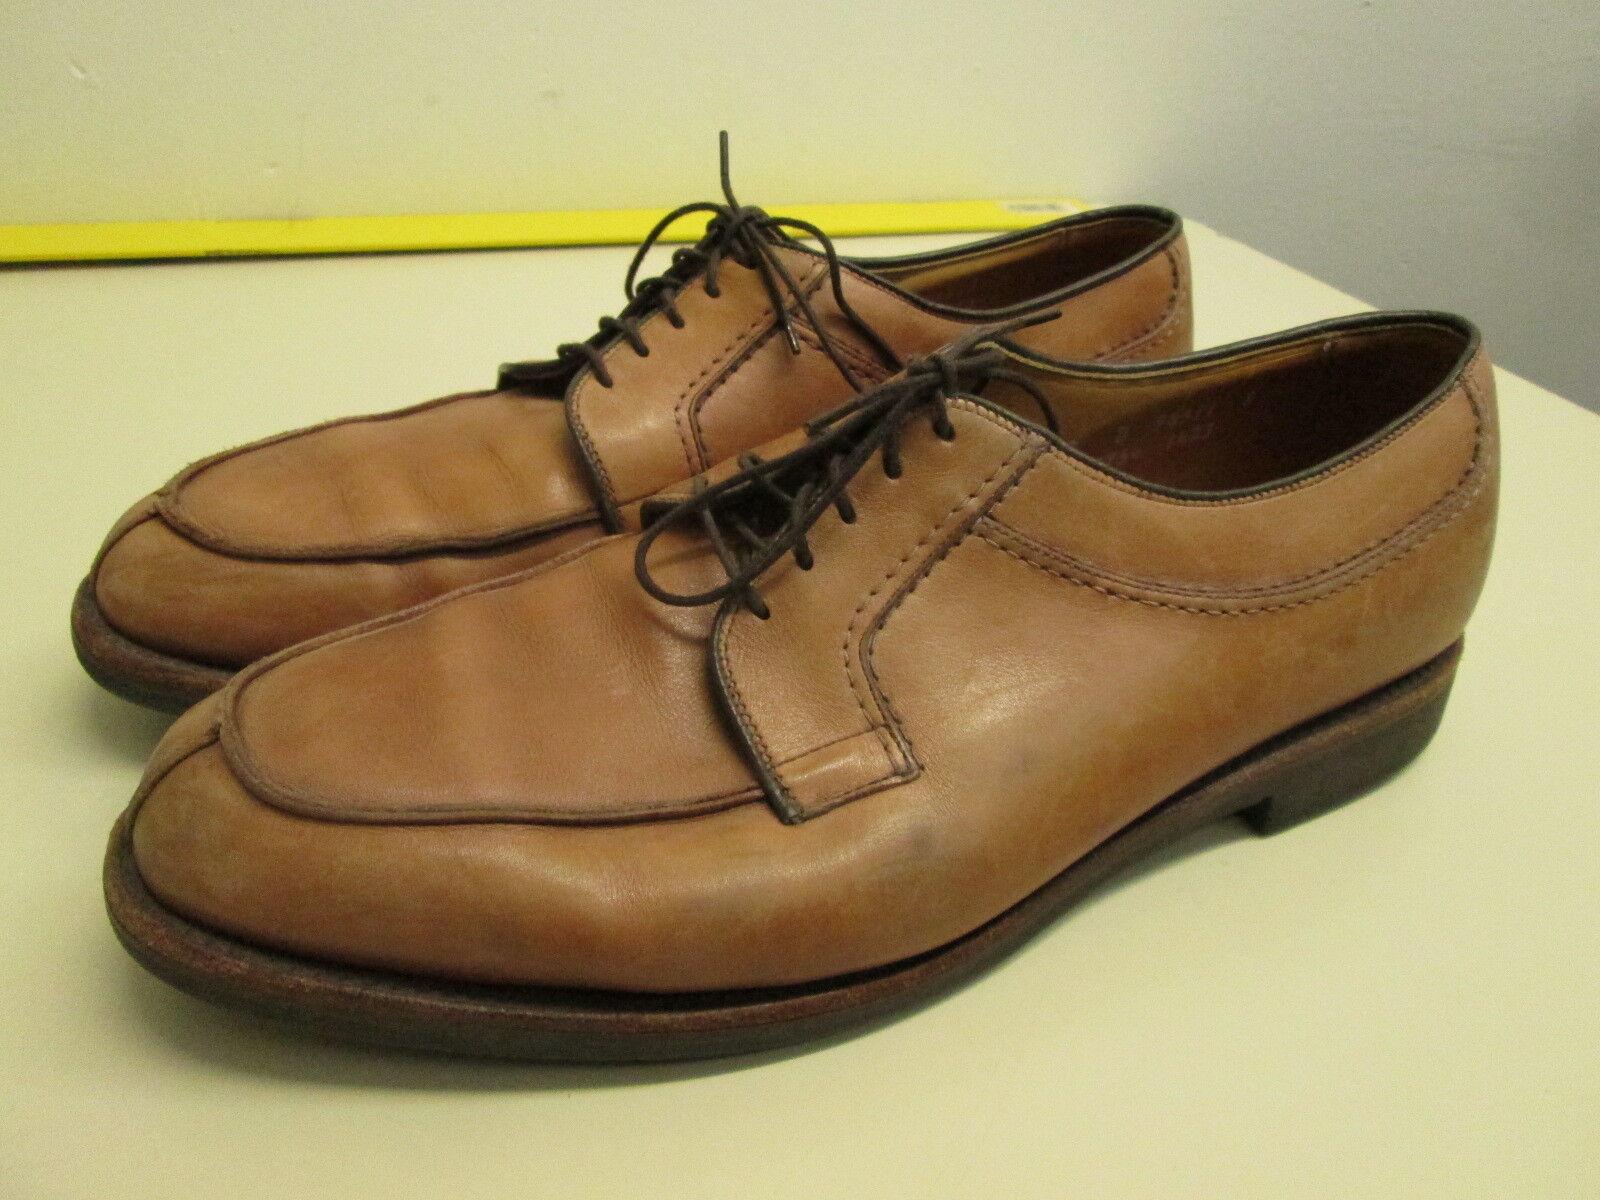 Men's Allen Edmonds Stockbridge brown Leather Oxford Shoes 12 D Made in USA